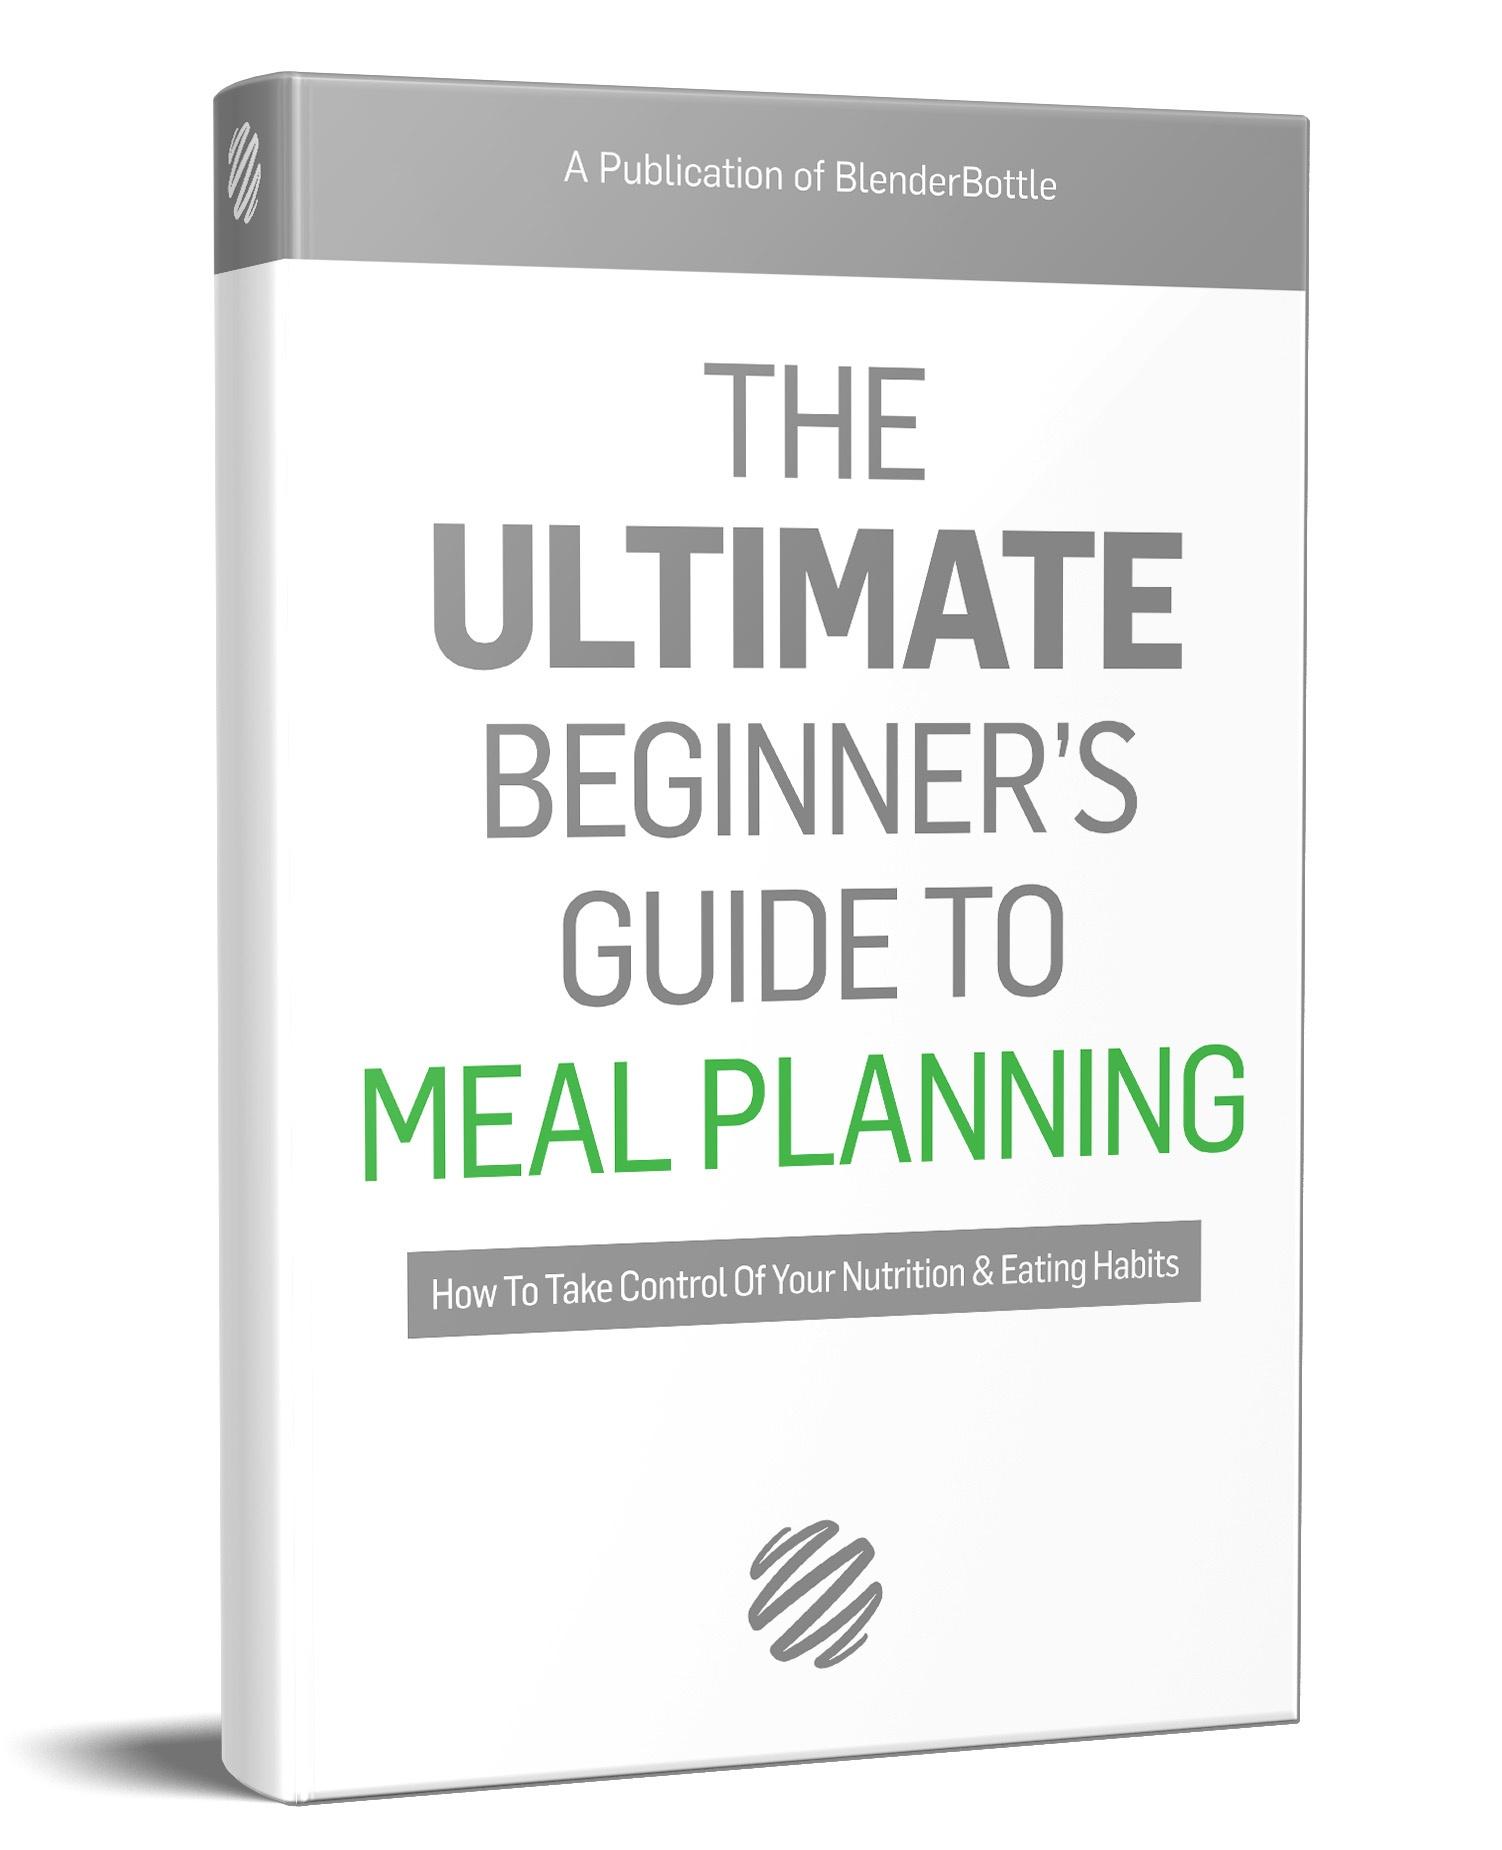 Ultimate Meal Planning Guide.jpg